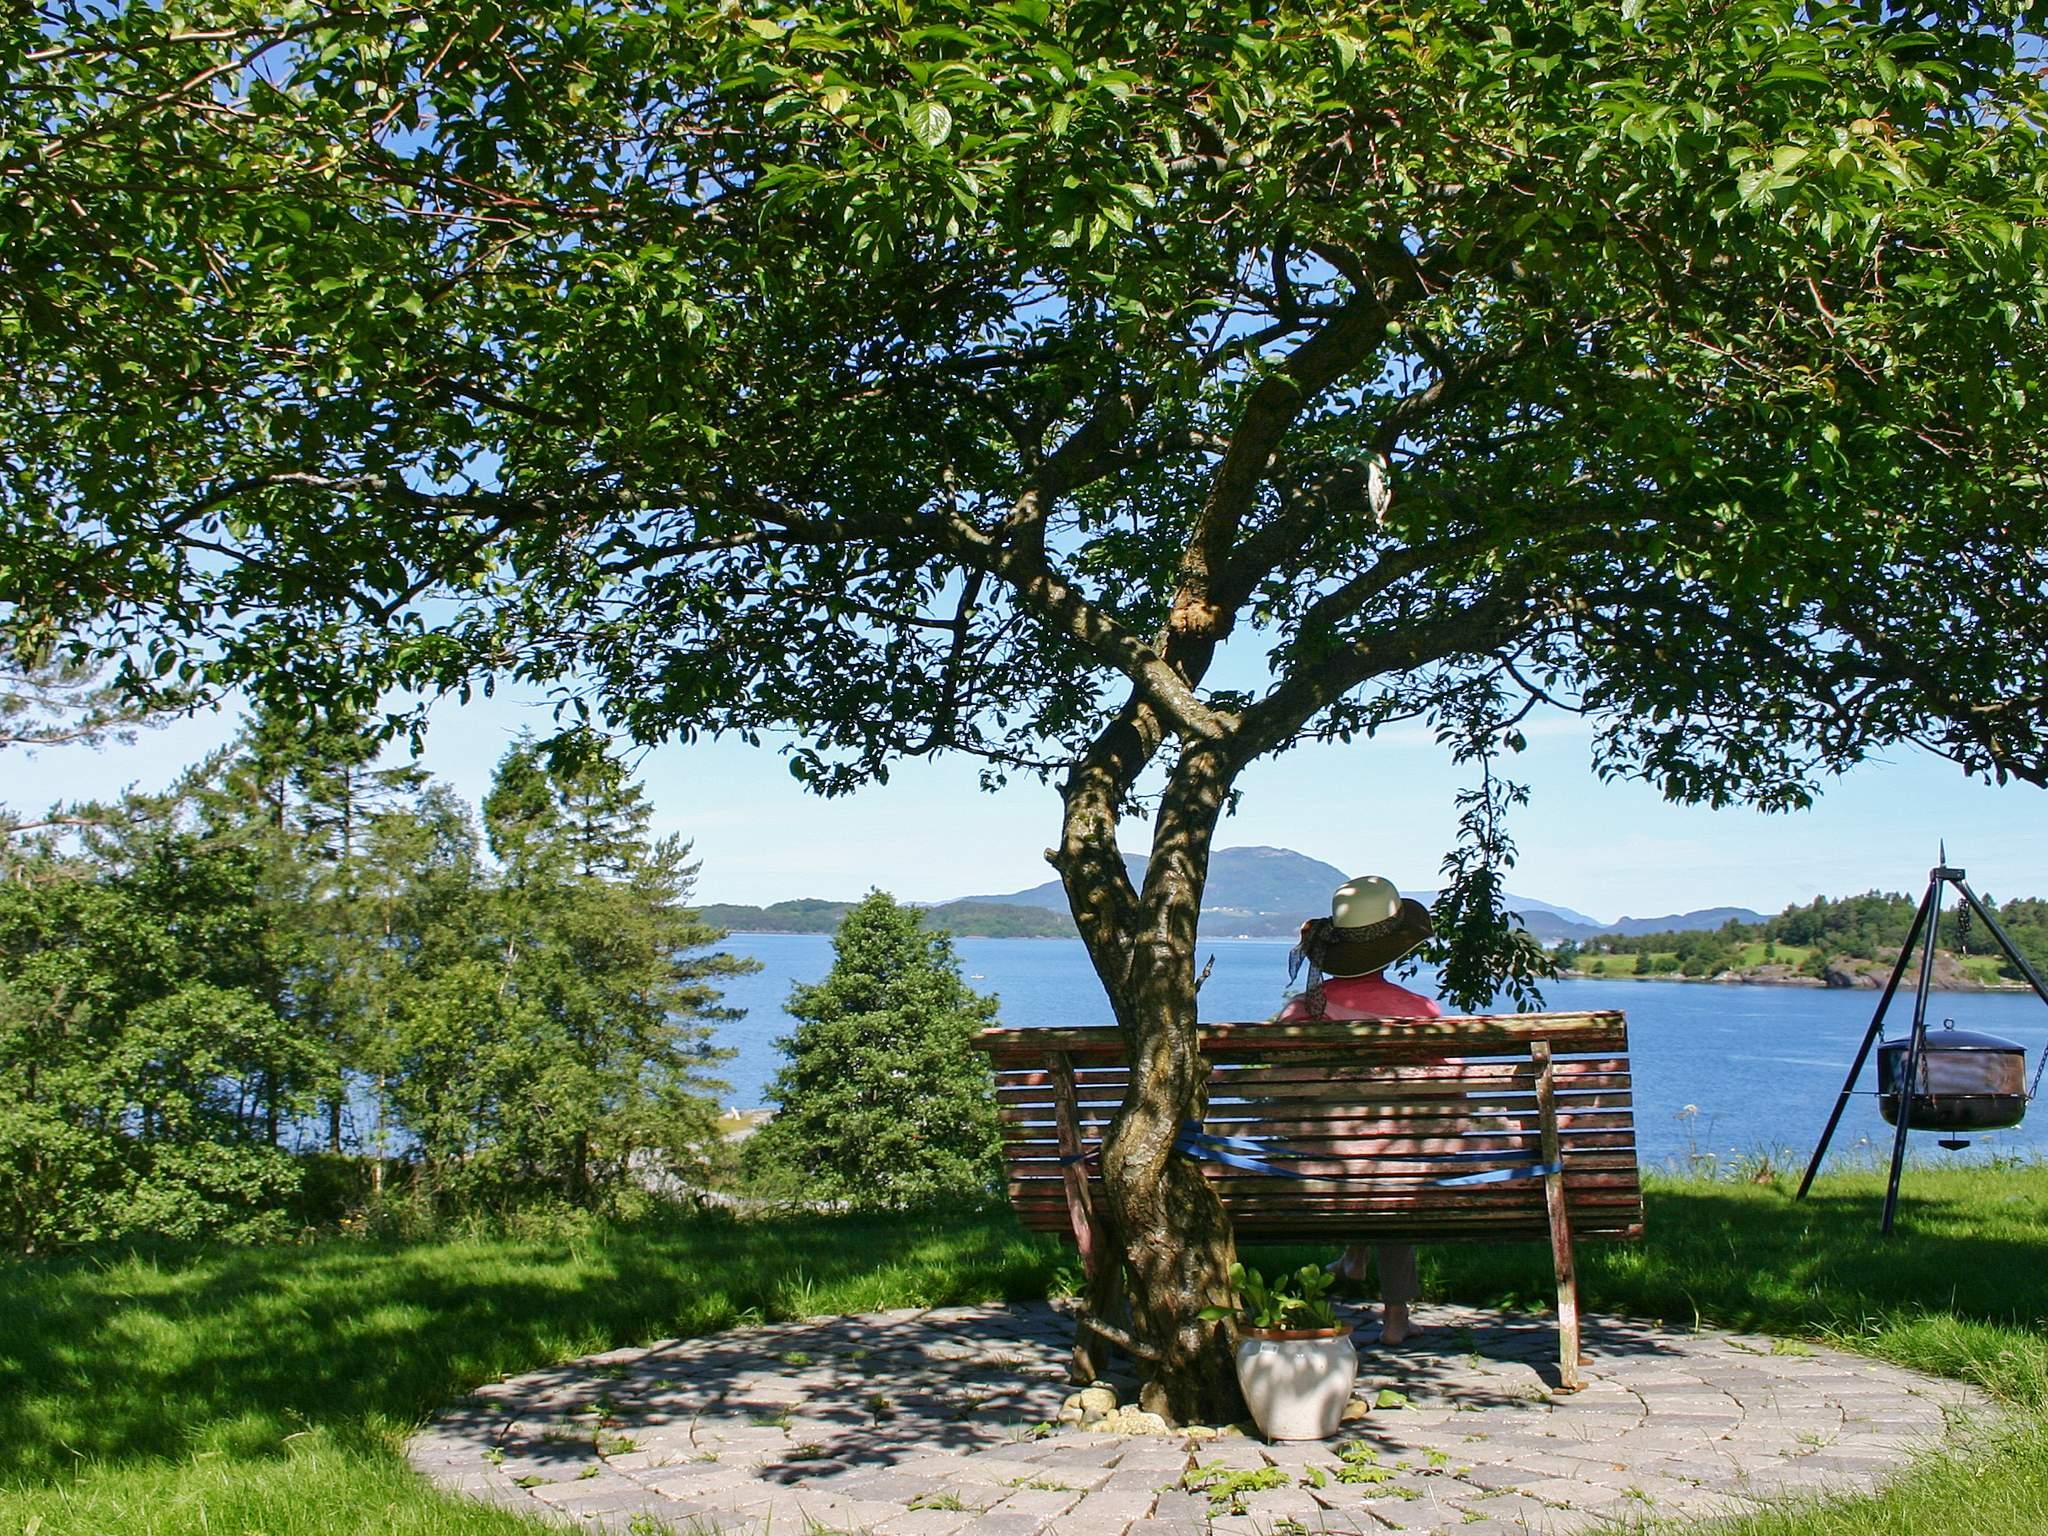 Ferienhaus Etne (2538129), Etne, Hordaland - Hardangerfjord, Westnorwegen, Norwegen, Bild 19